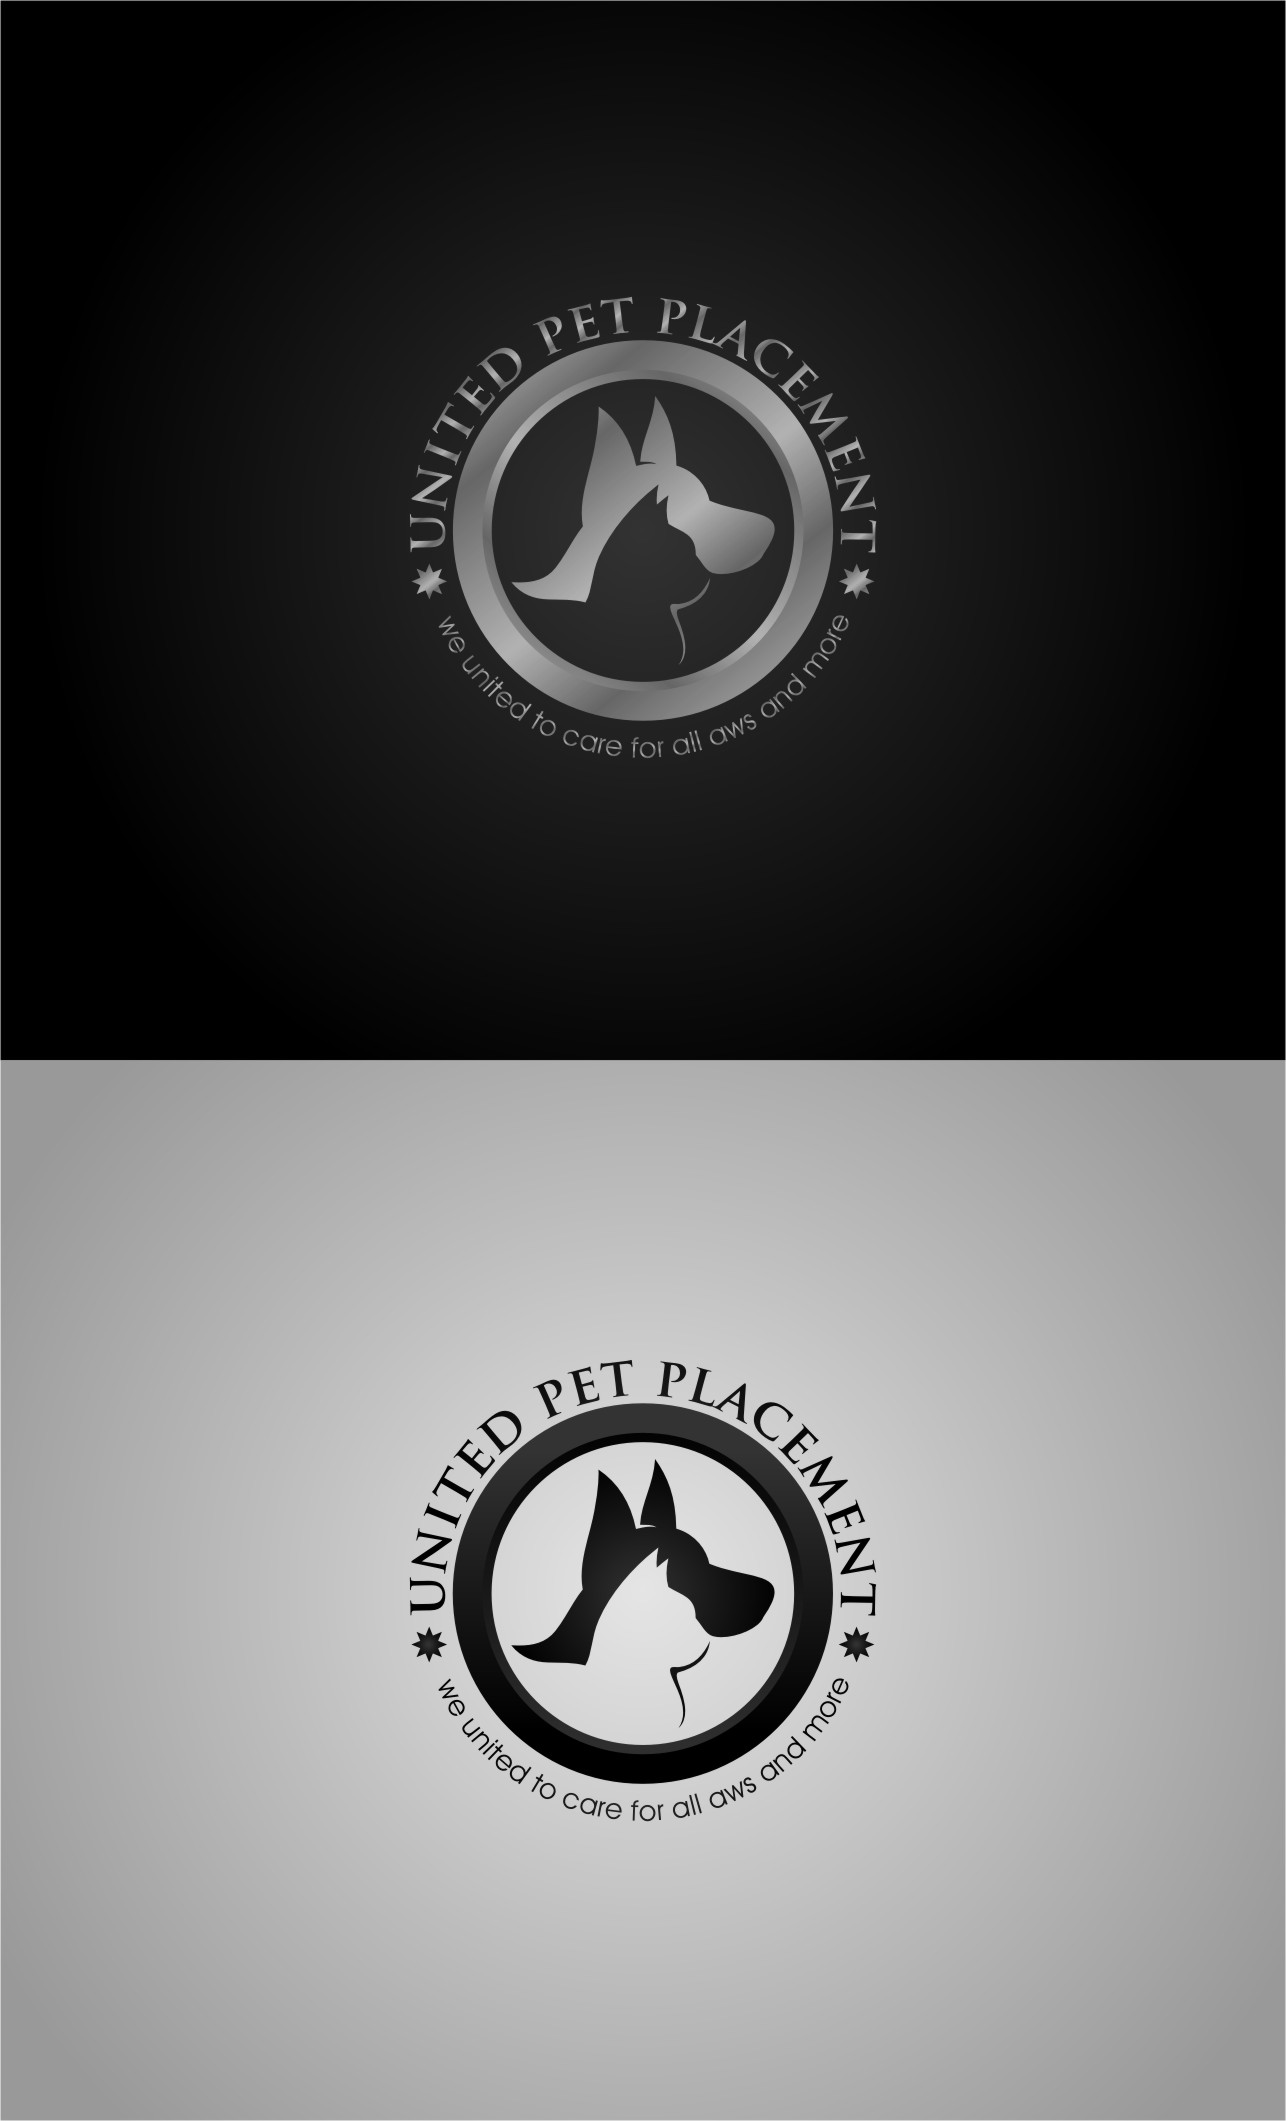 Logo Design by RasYa Muhammad Athaya - Entry No. 71 in the Logo Design Contest Artistic Logo Design for united pet placement.